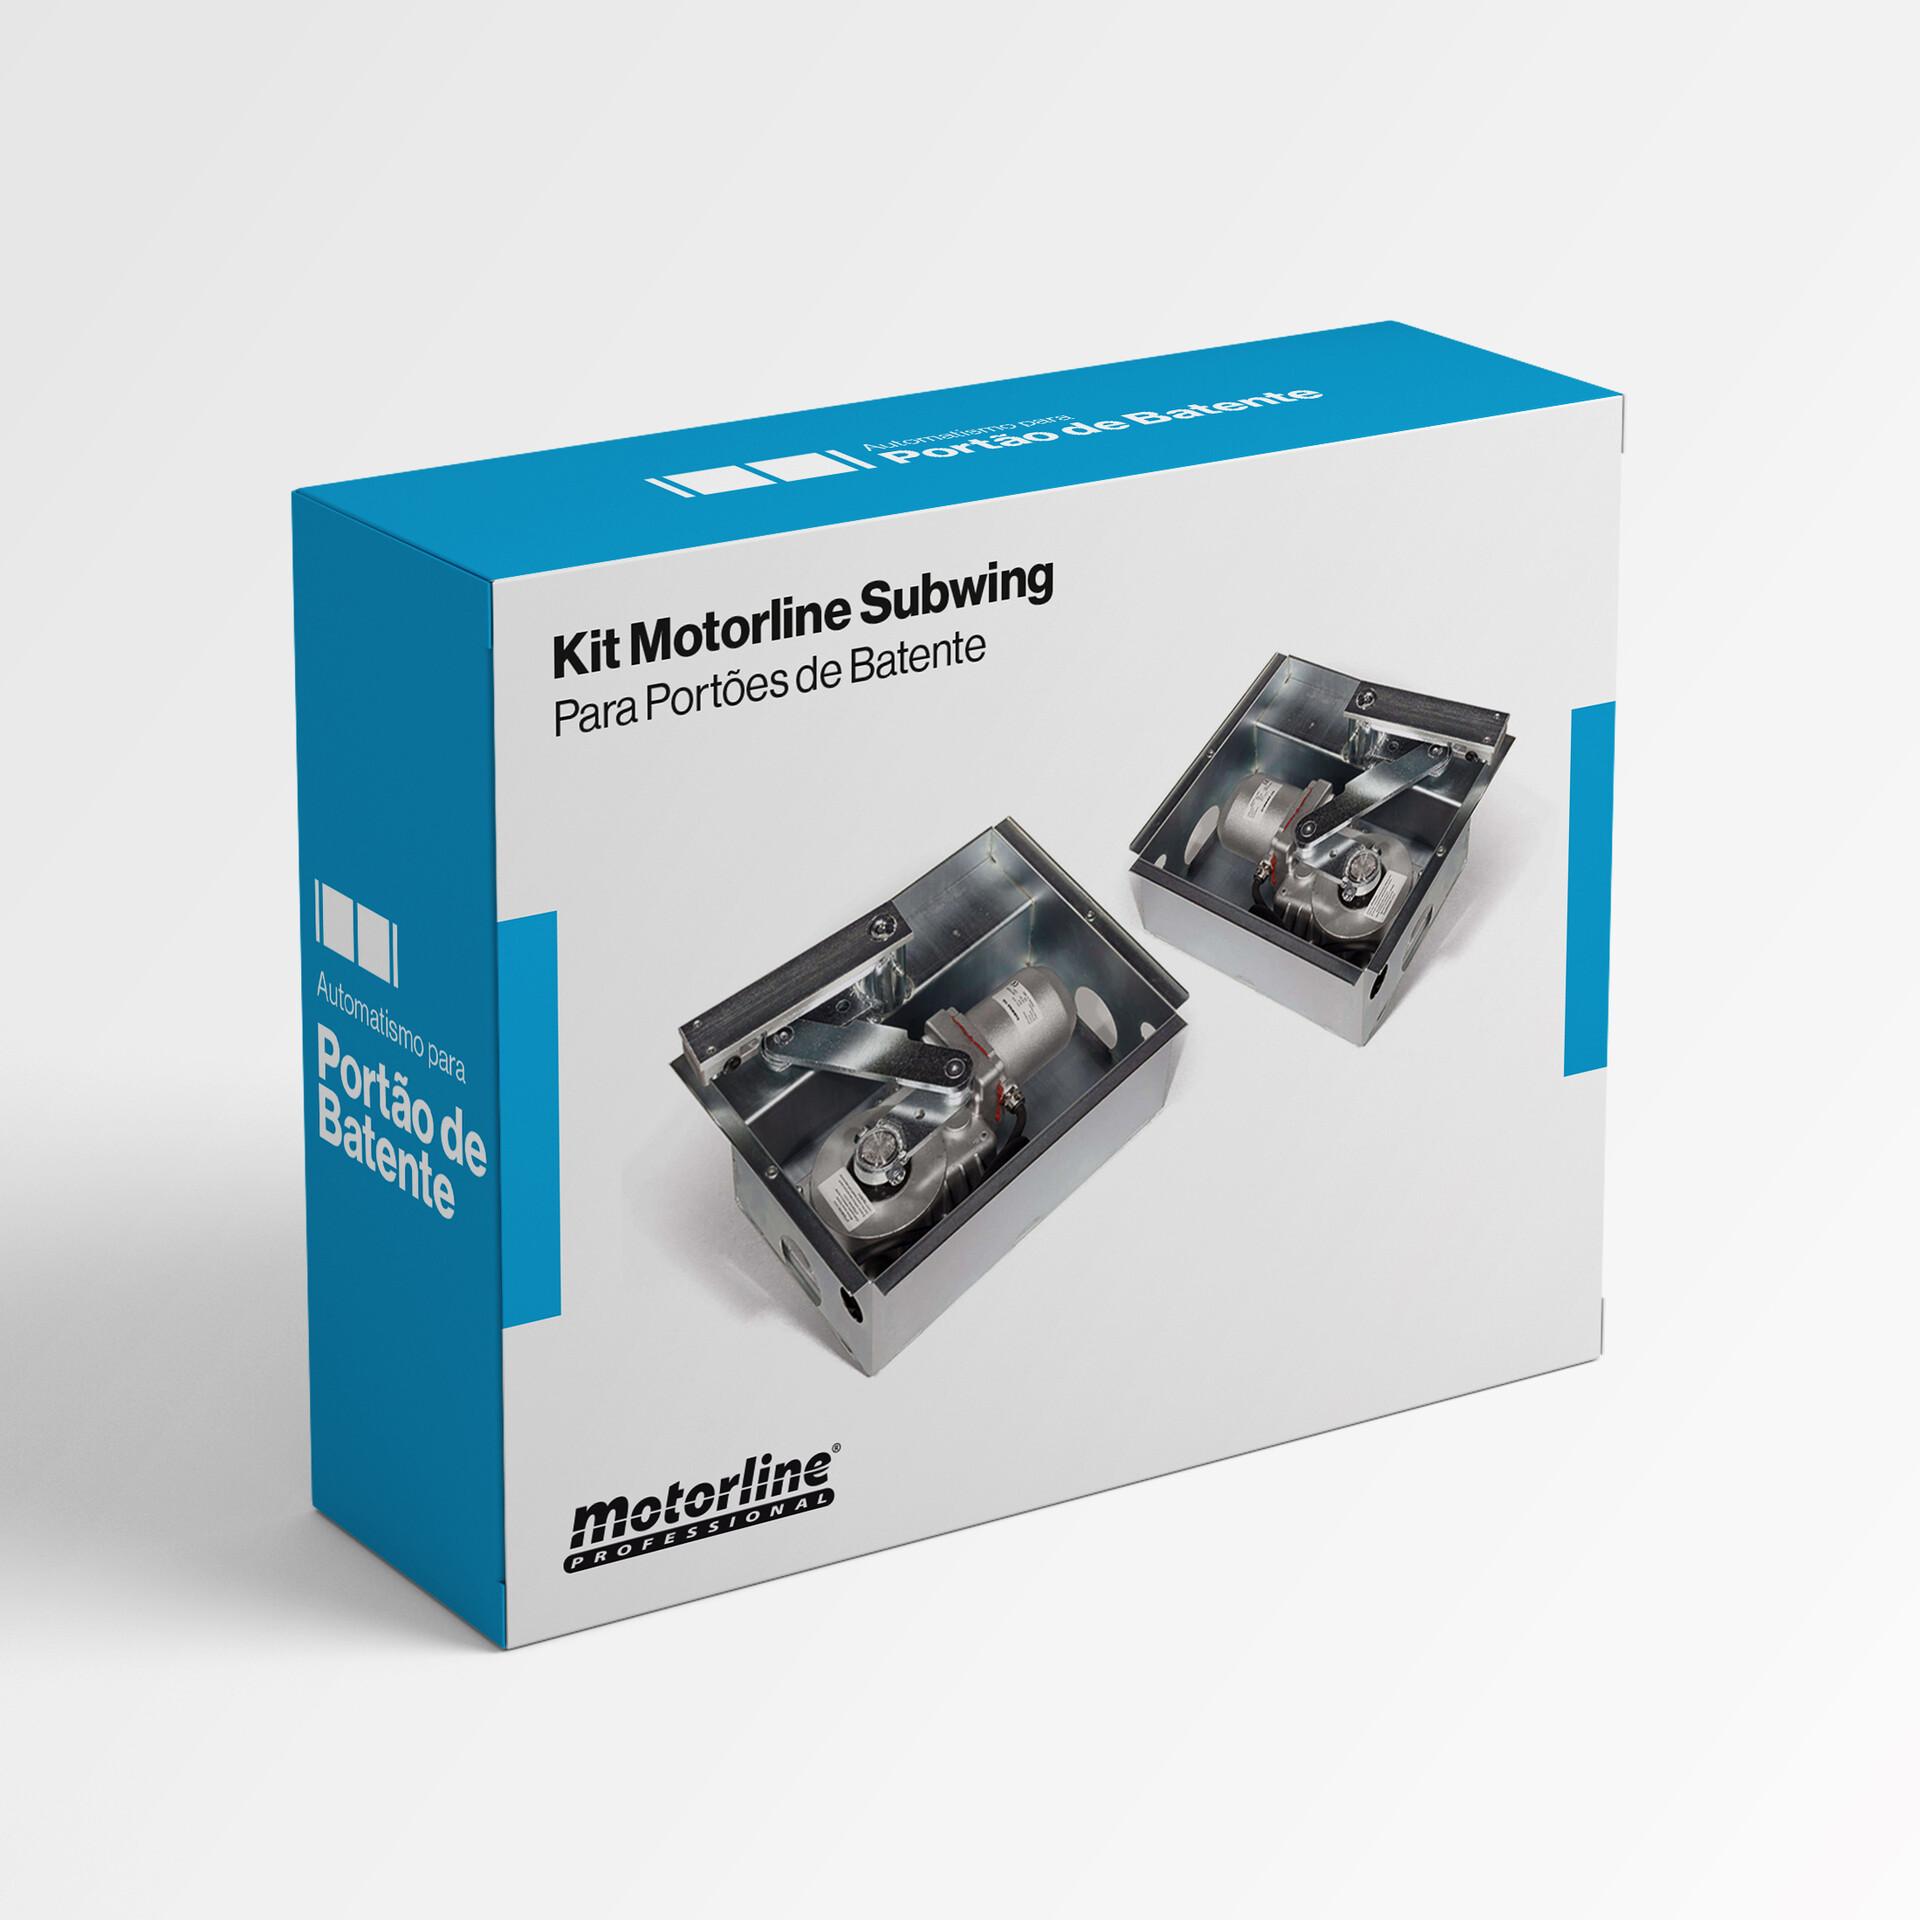 Catálogo Motorline Subwing